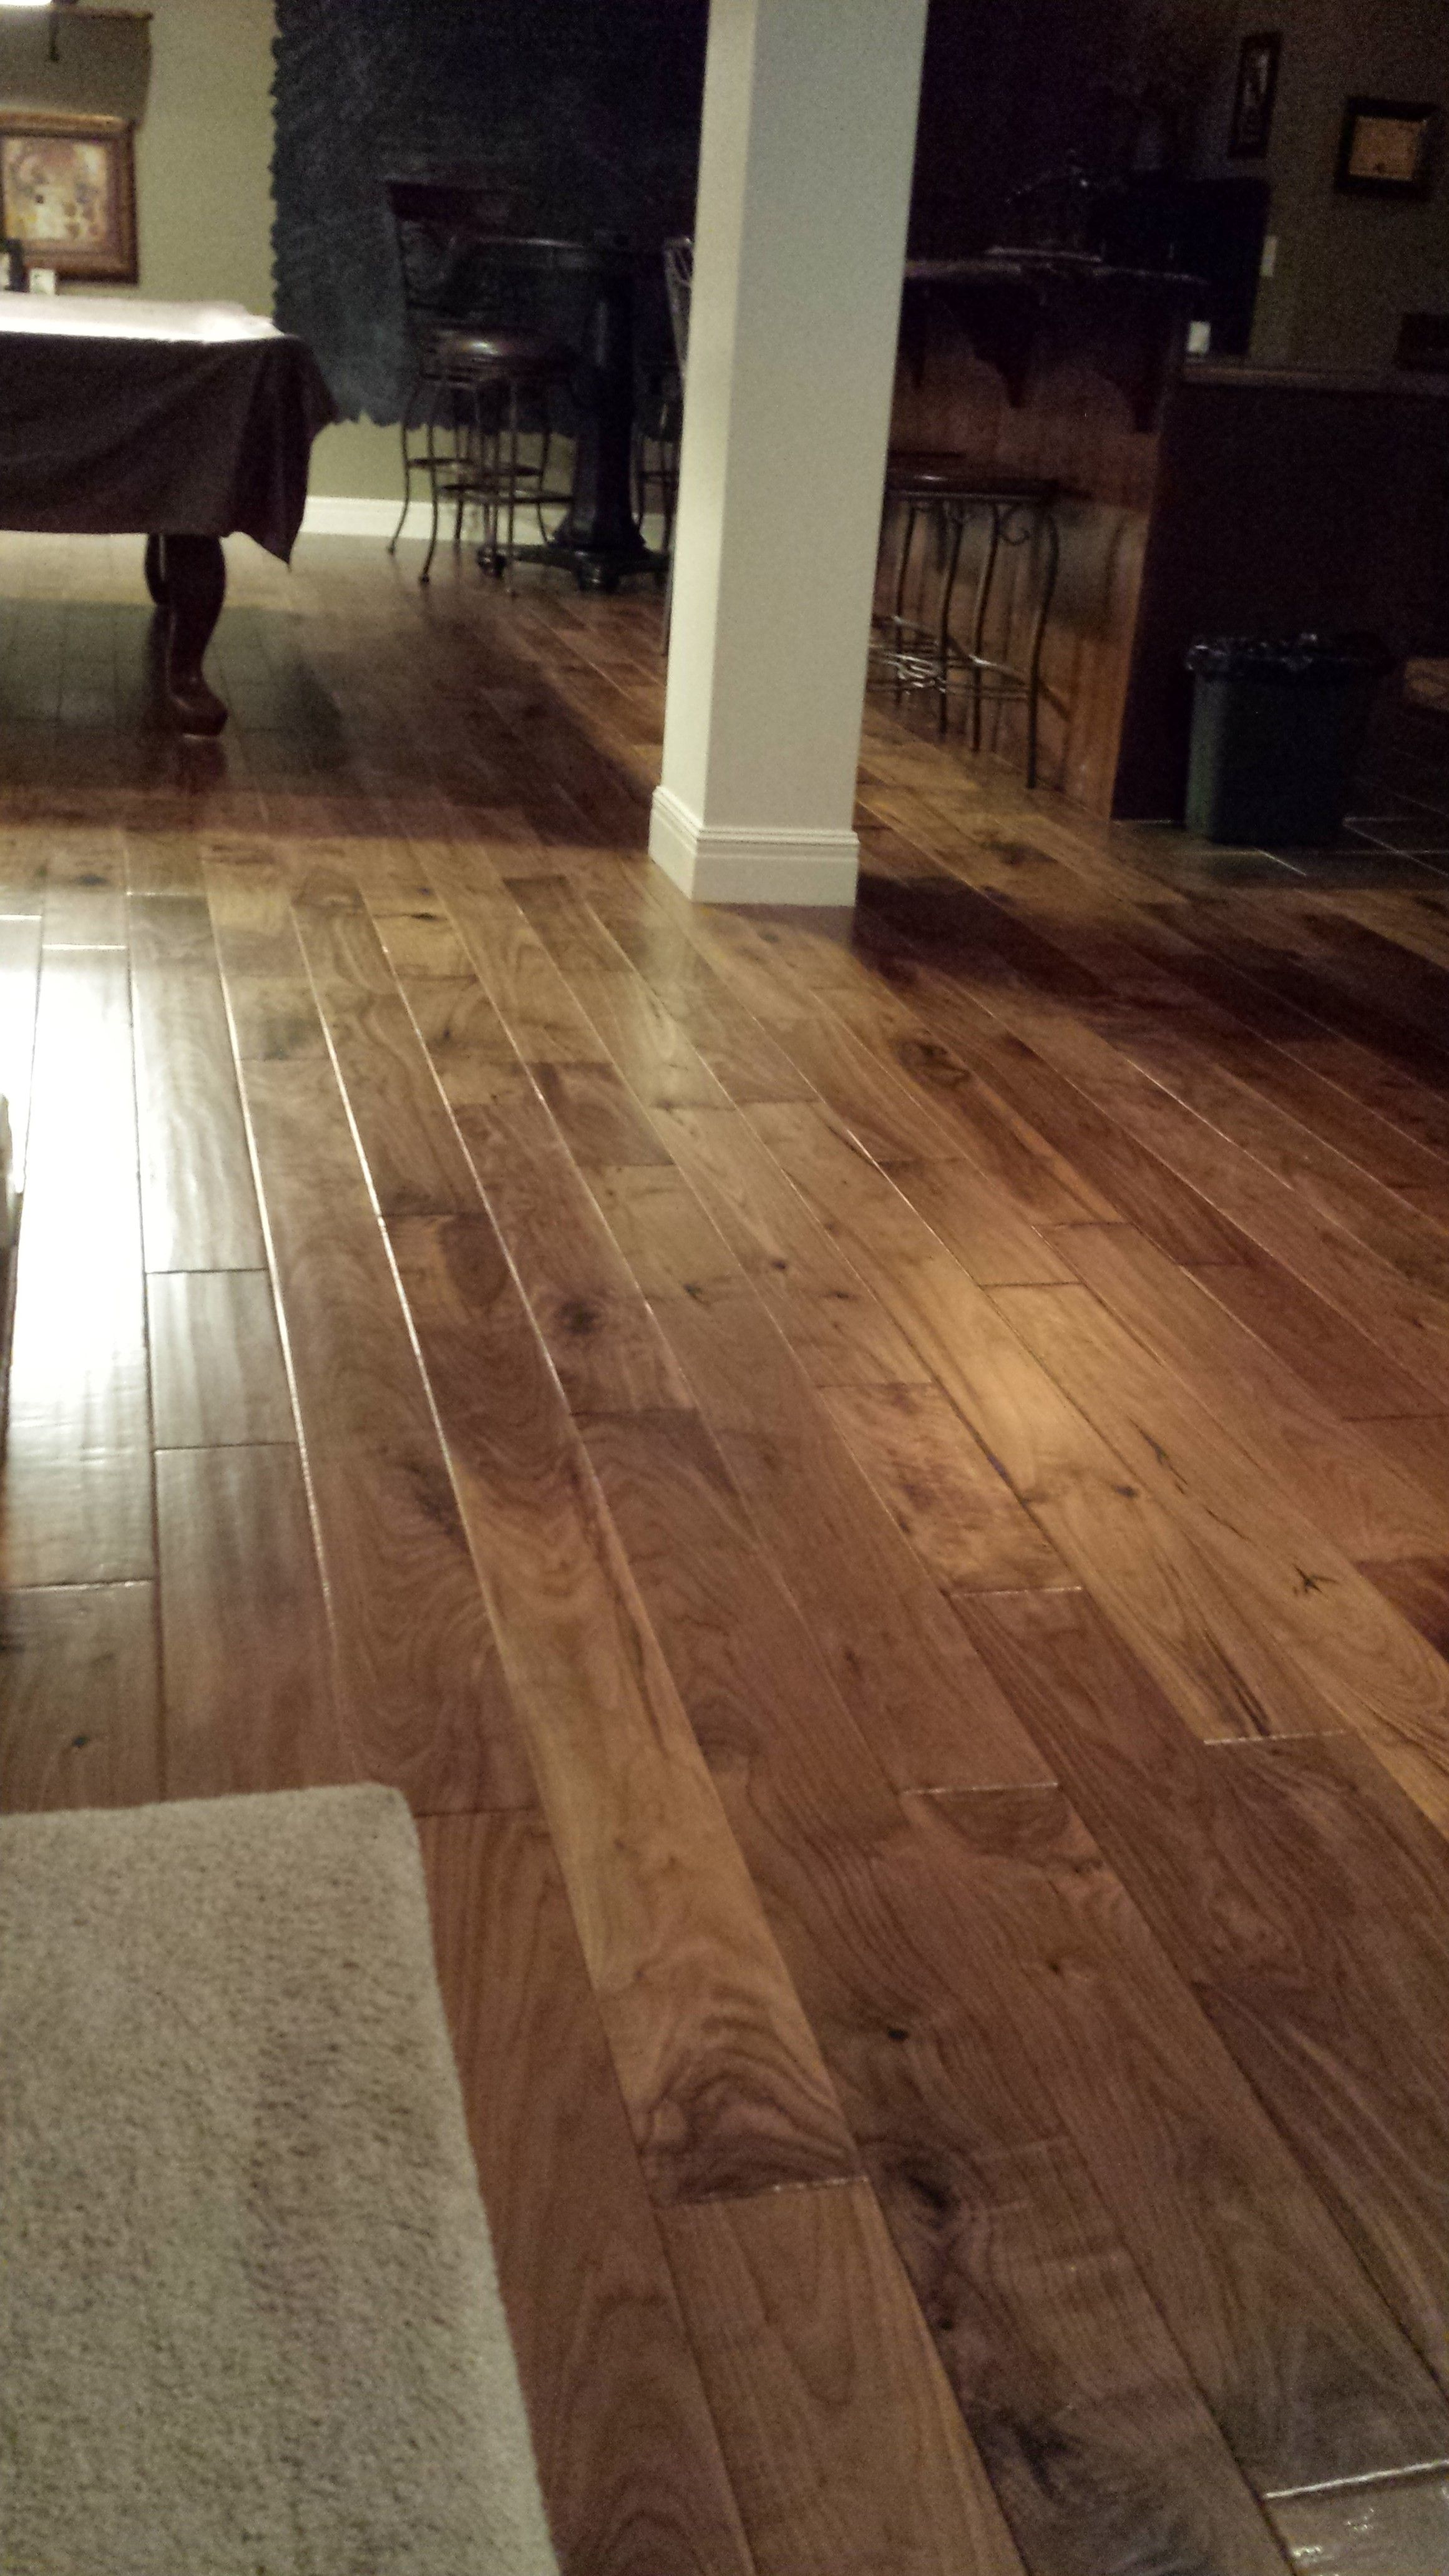 Natural Walnut Floors Installation In Kansas Home Flooring Refinishing Hardwood Floors Walnut Floors